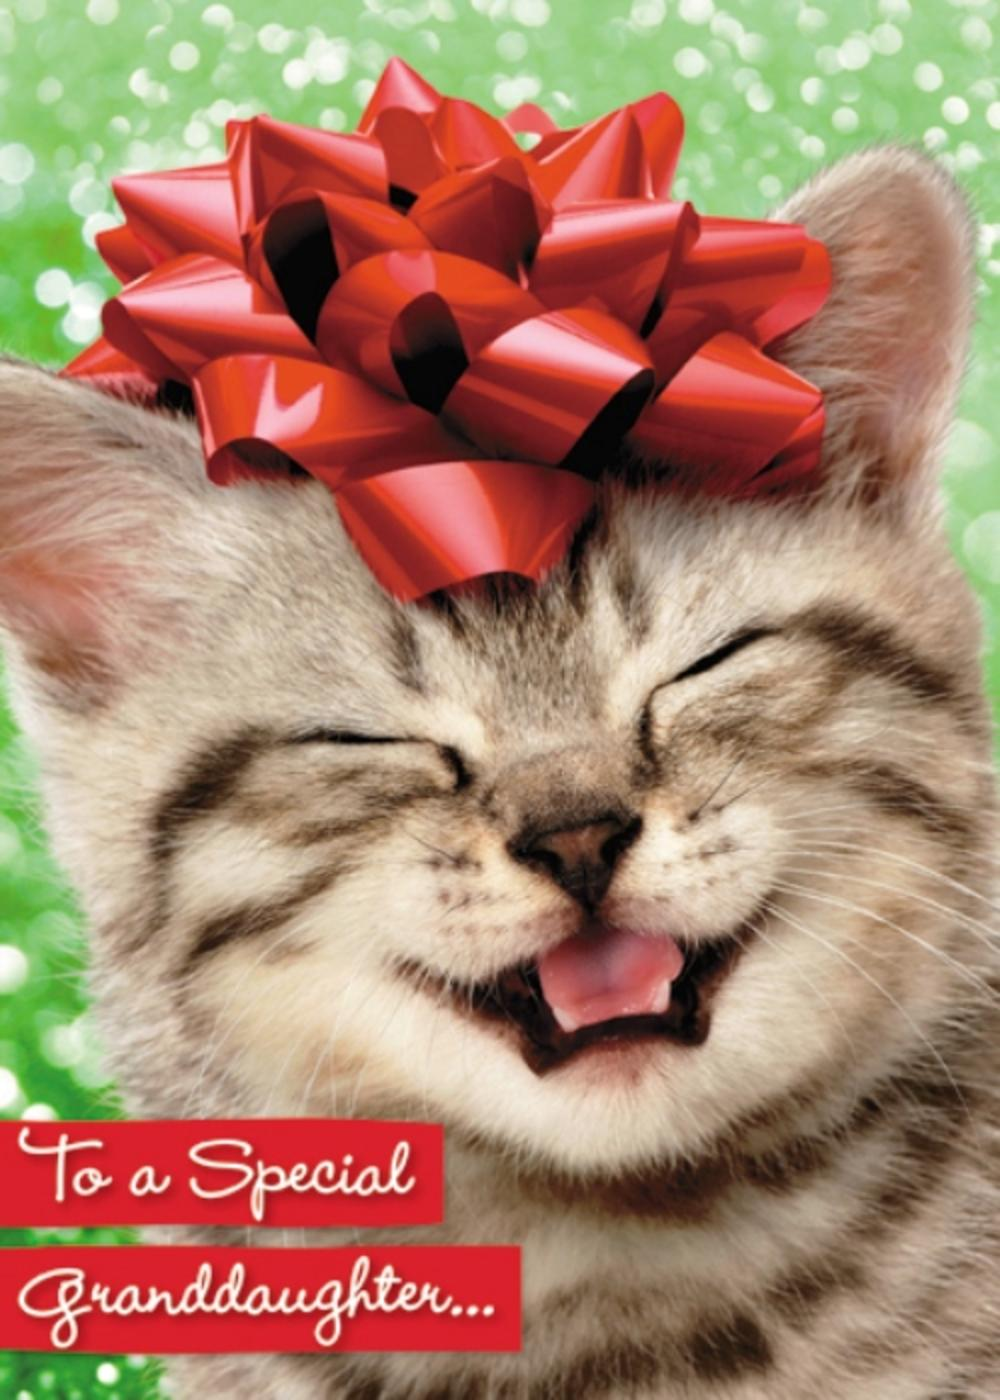 Avanti Granddaughter Funny Christmas Greeting Card